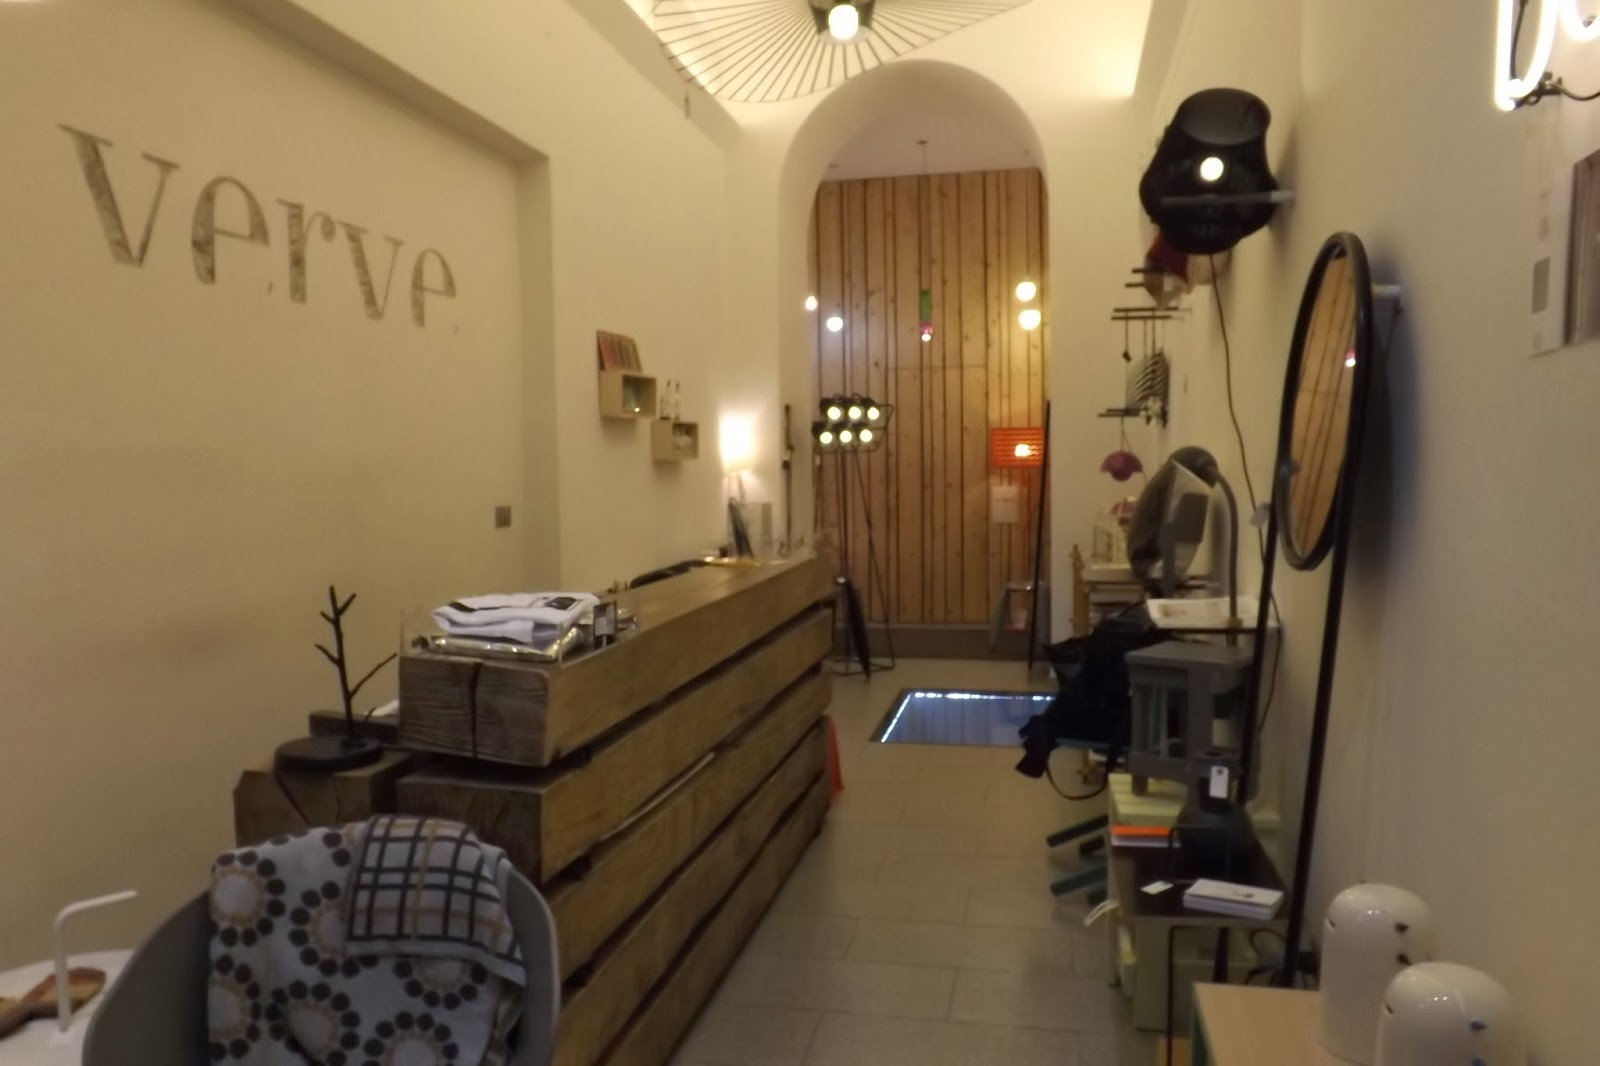 Negozi arredamento torino design arredamento negozi for Arredo negozi torino